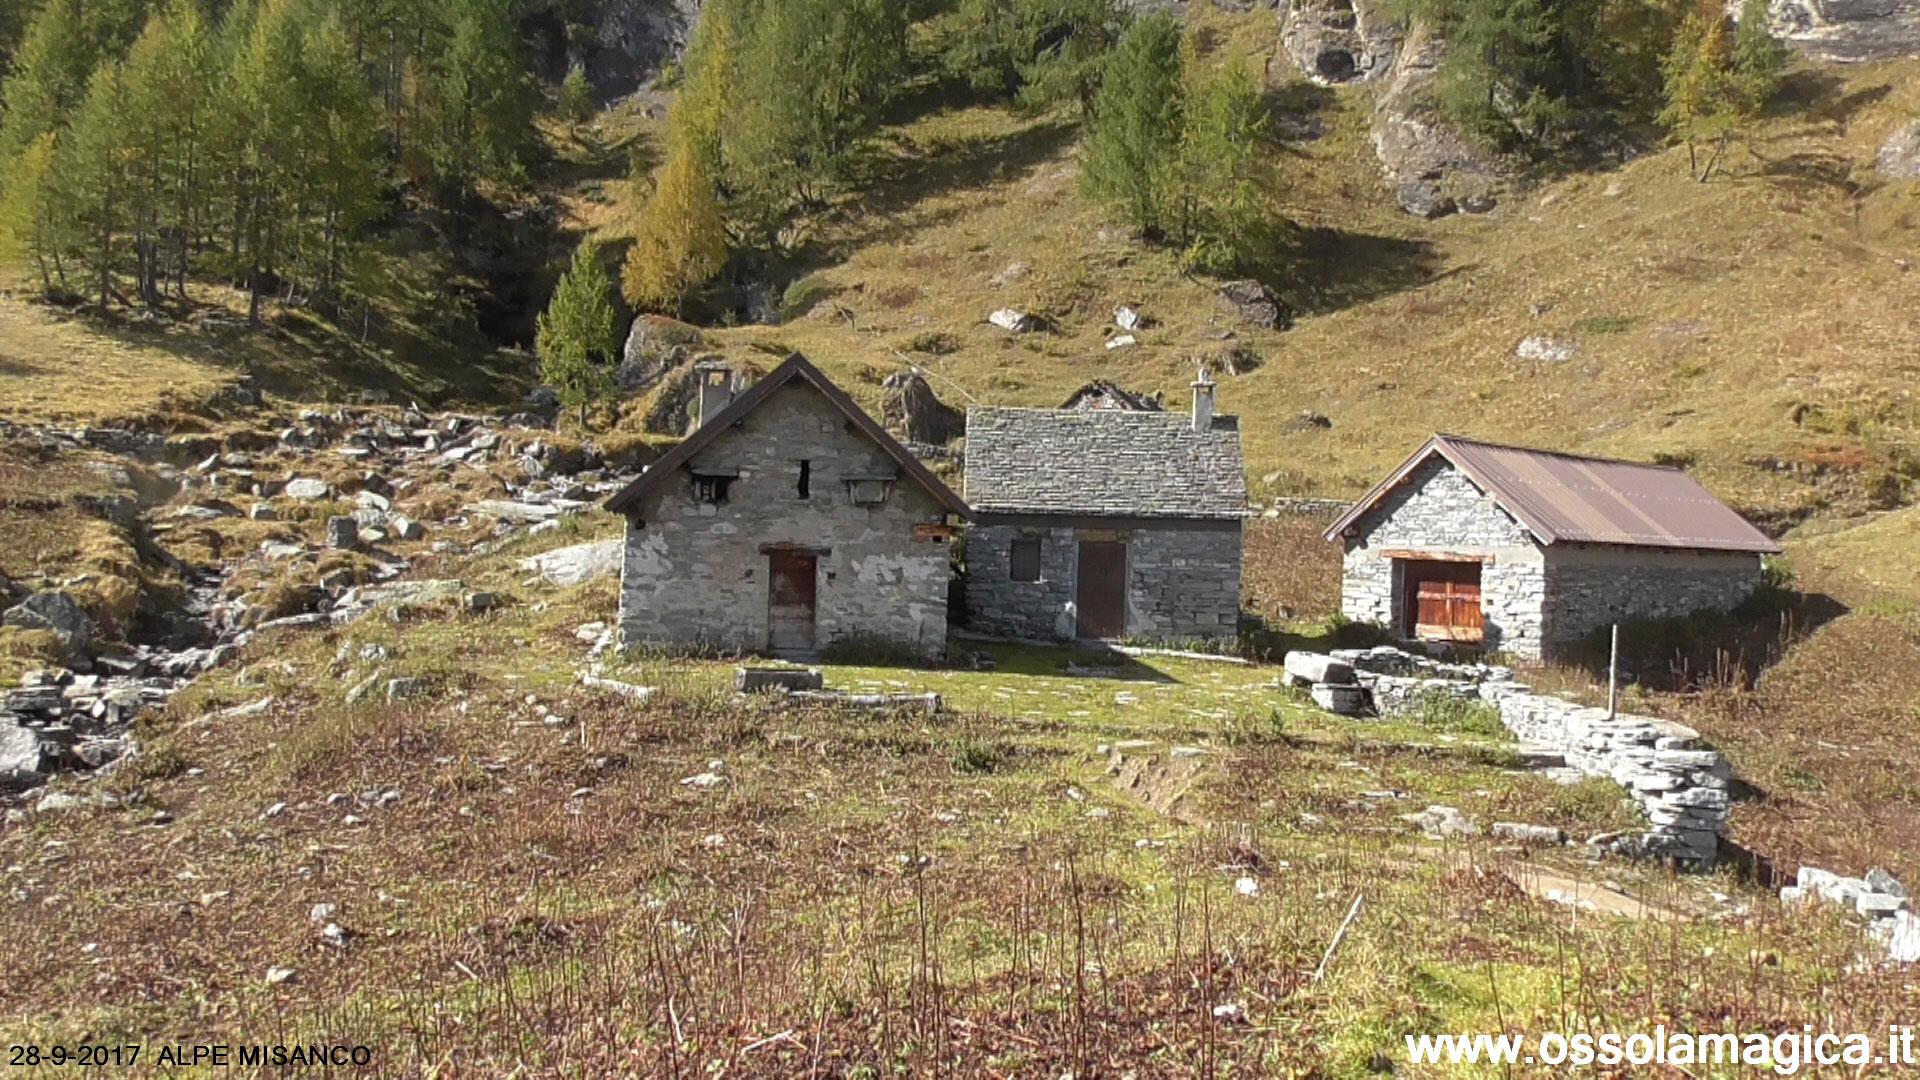 Alpe Misanco